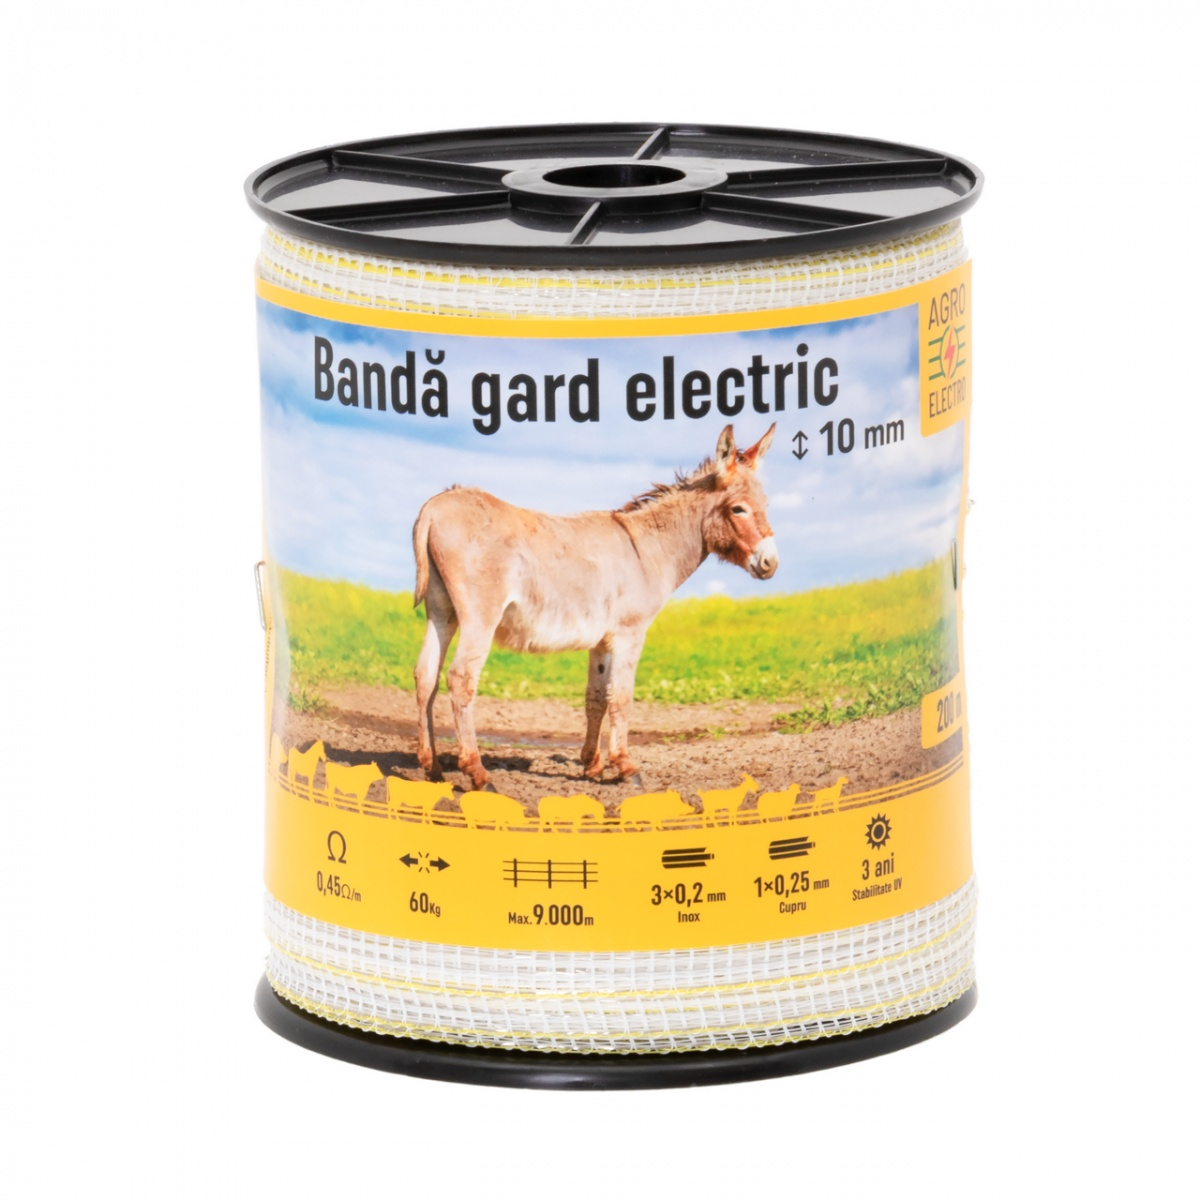 Bandă gard electric - 10 mm - 200m - 60kg - 0,45Ω/m